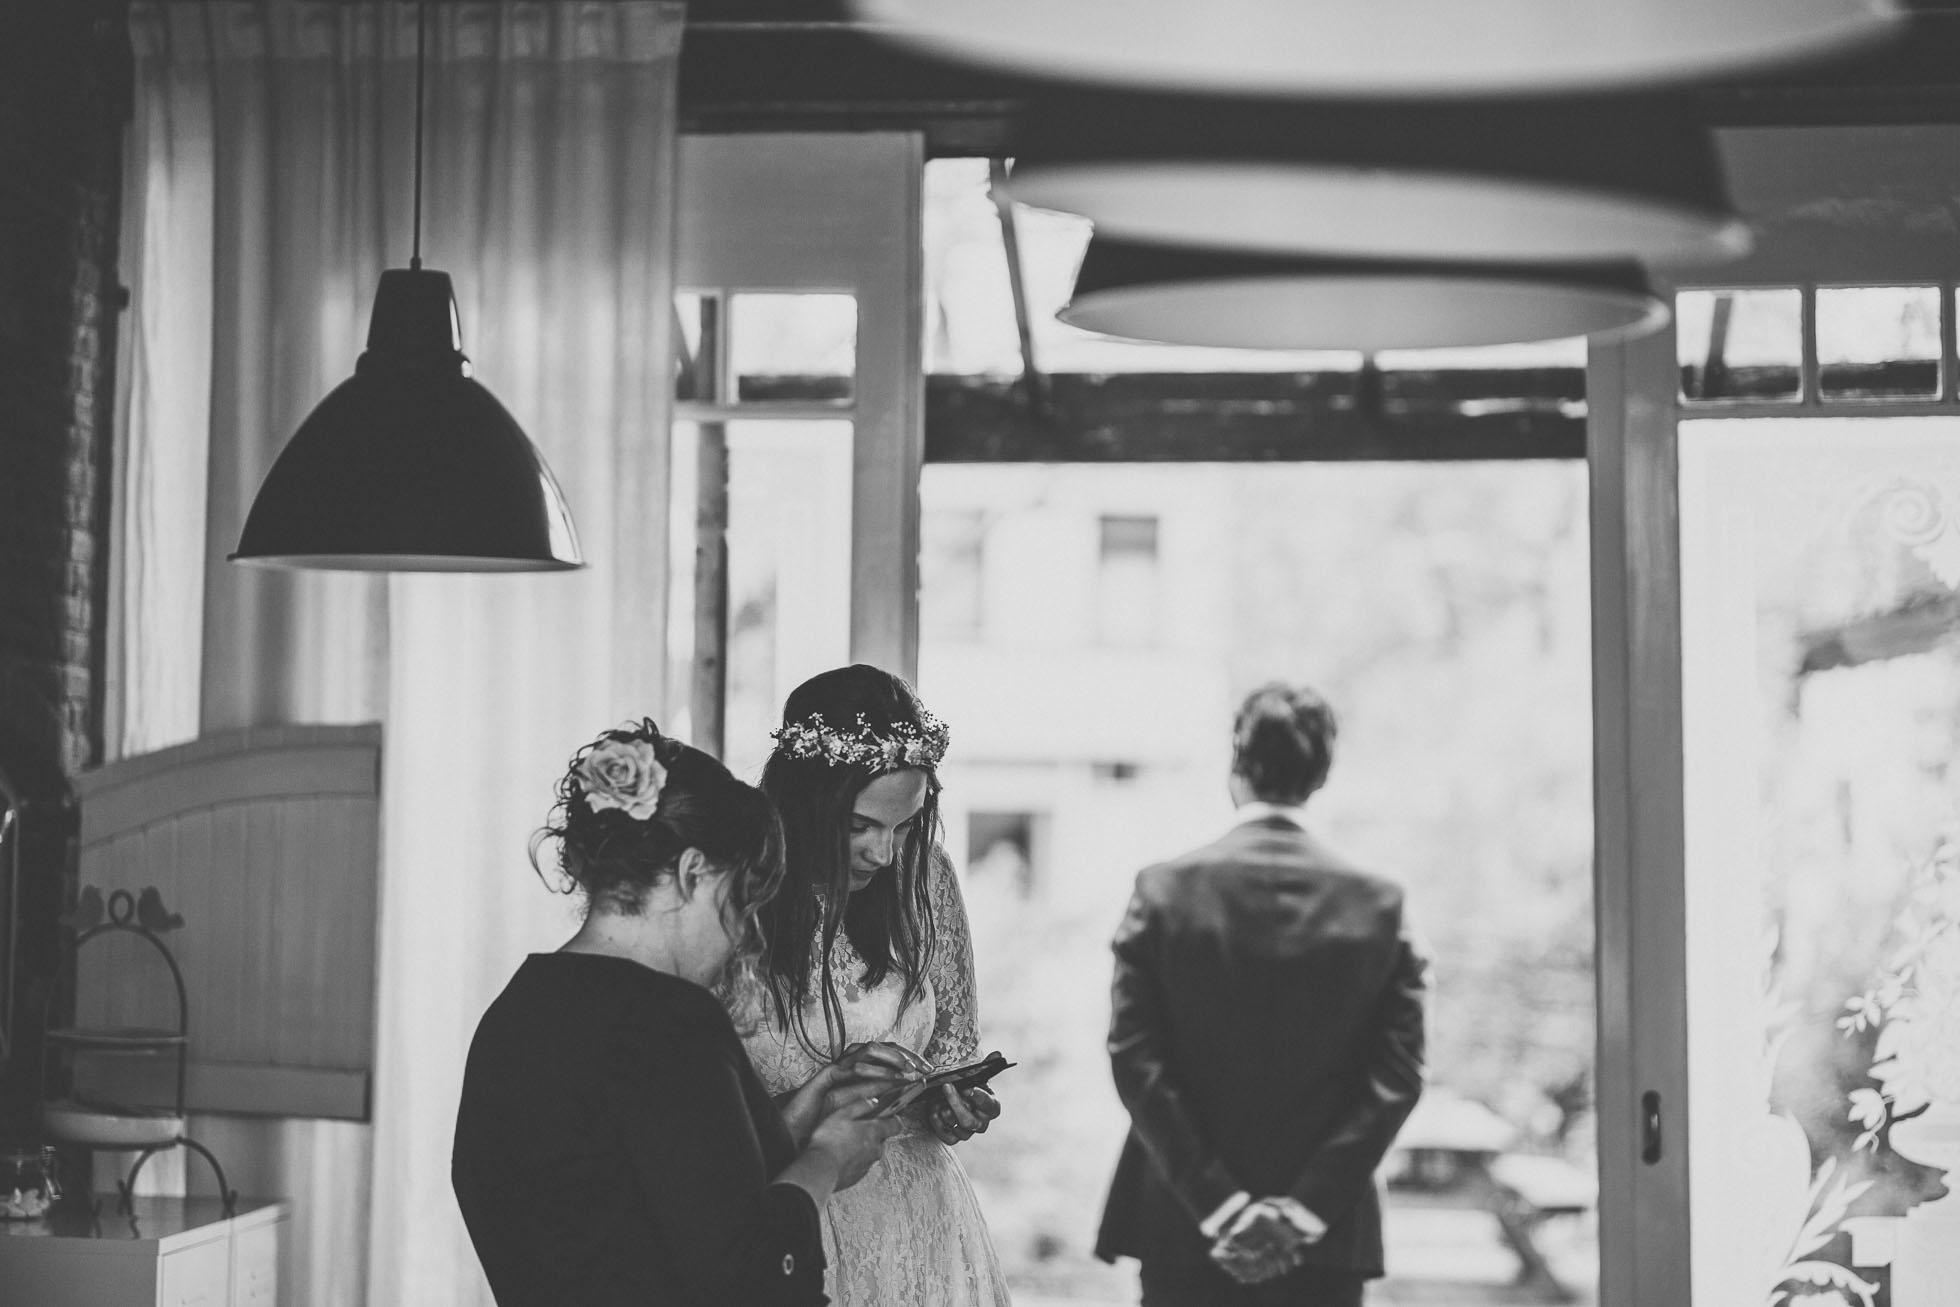 utrecht-wedding-photographer-53.jpg